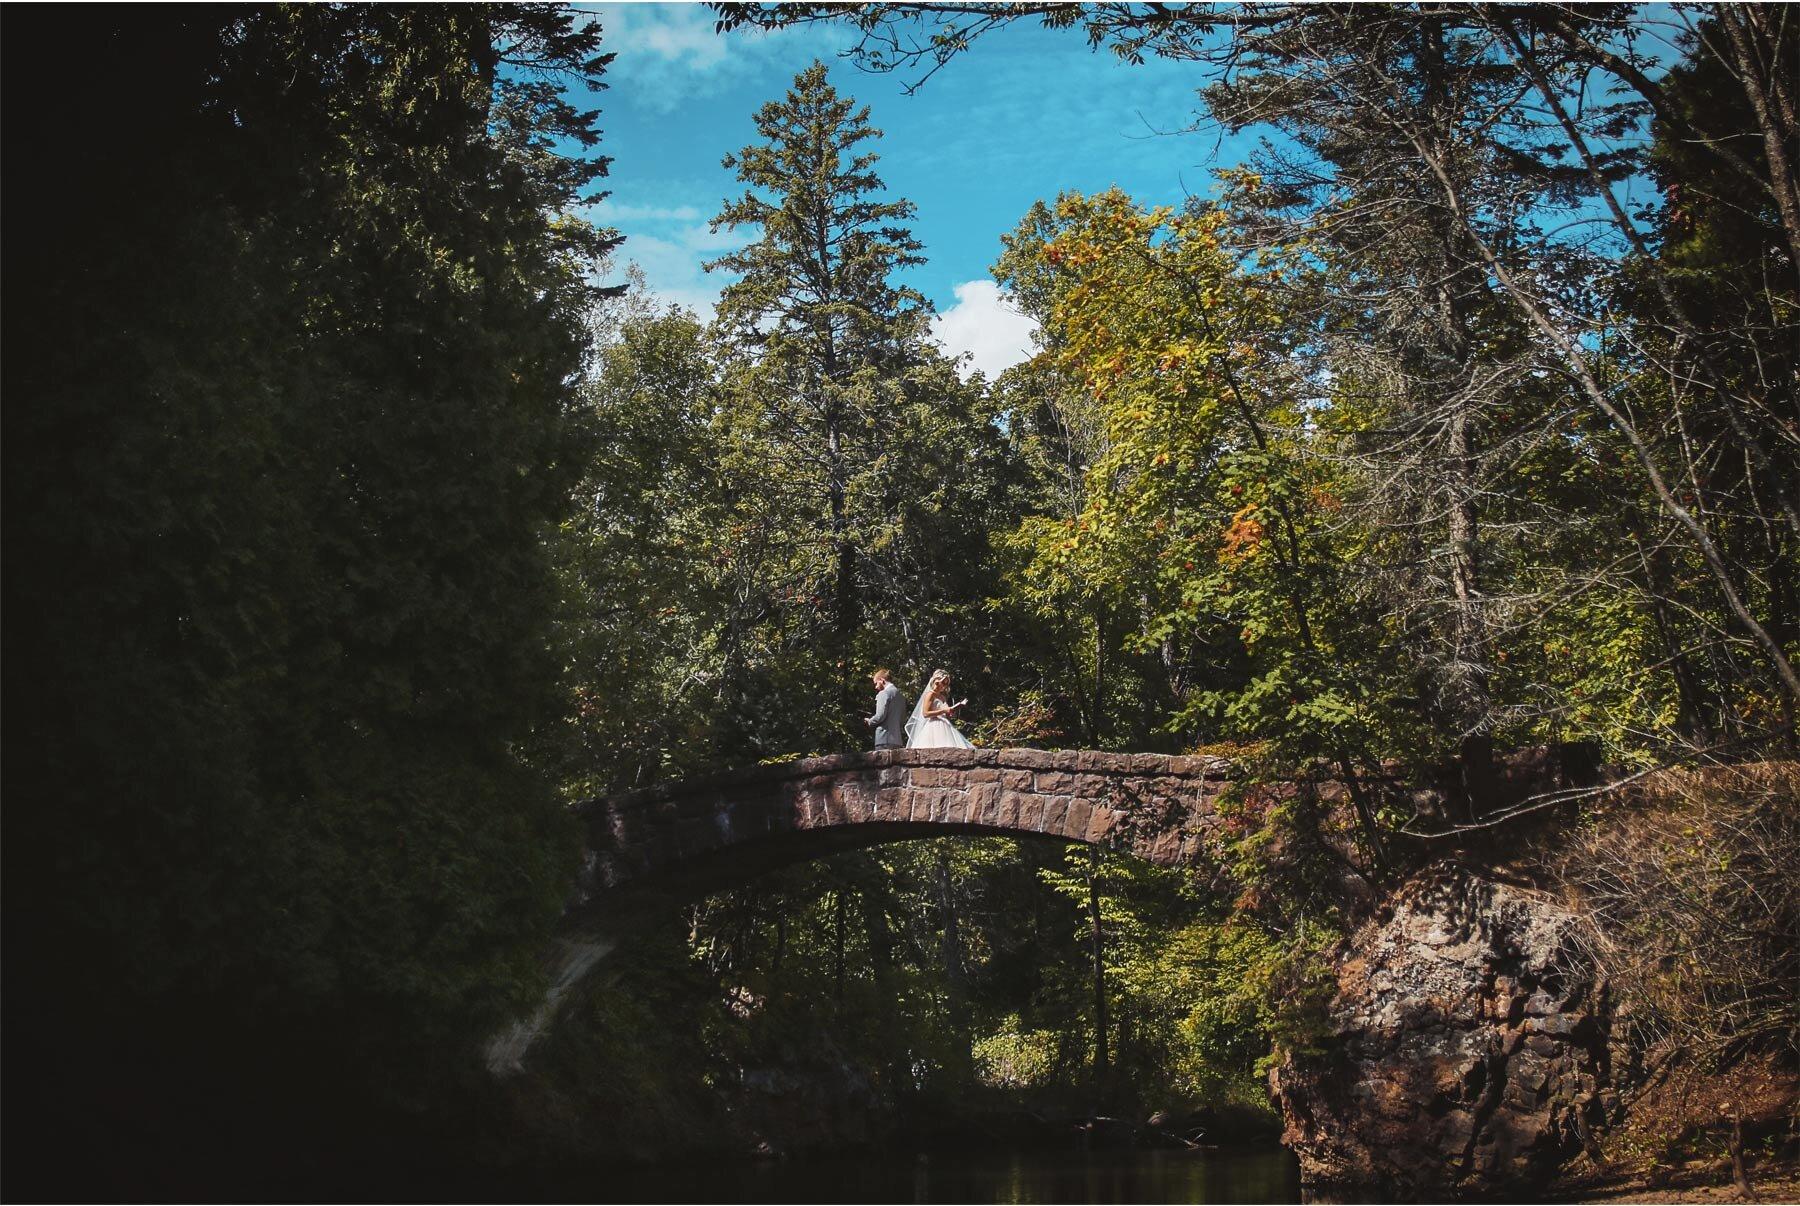 05-Vick-Photography-Wedding-Duluth-Minnesota-Glensheen-Mansion-Groom-Bride-Bridge-Blue-Sky-Catherine-and-John.jpg